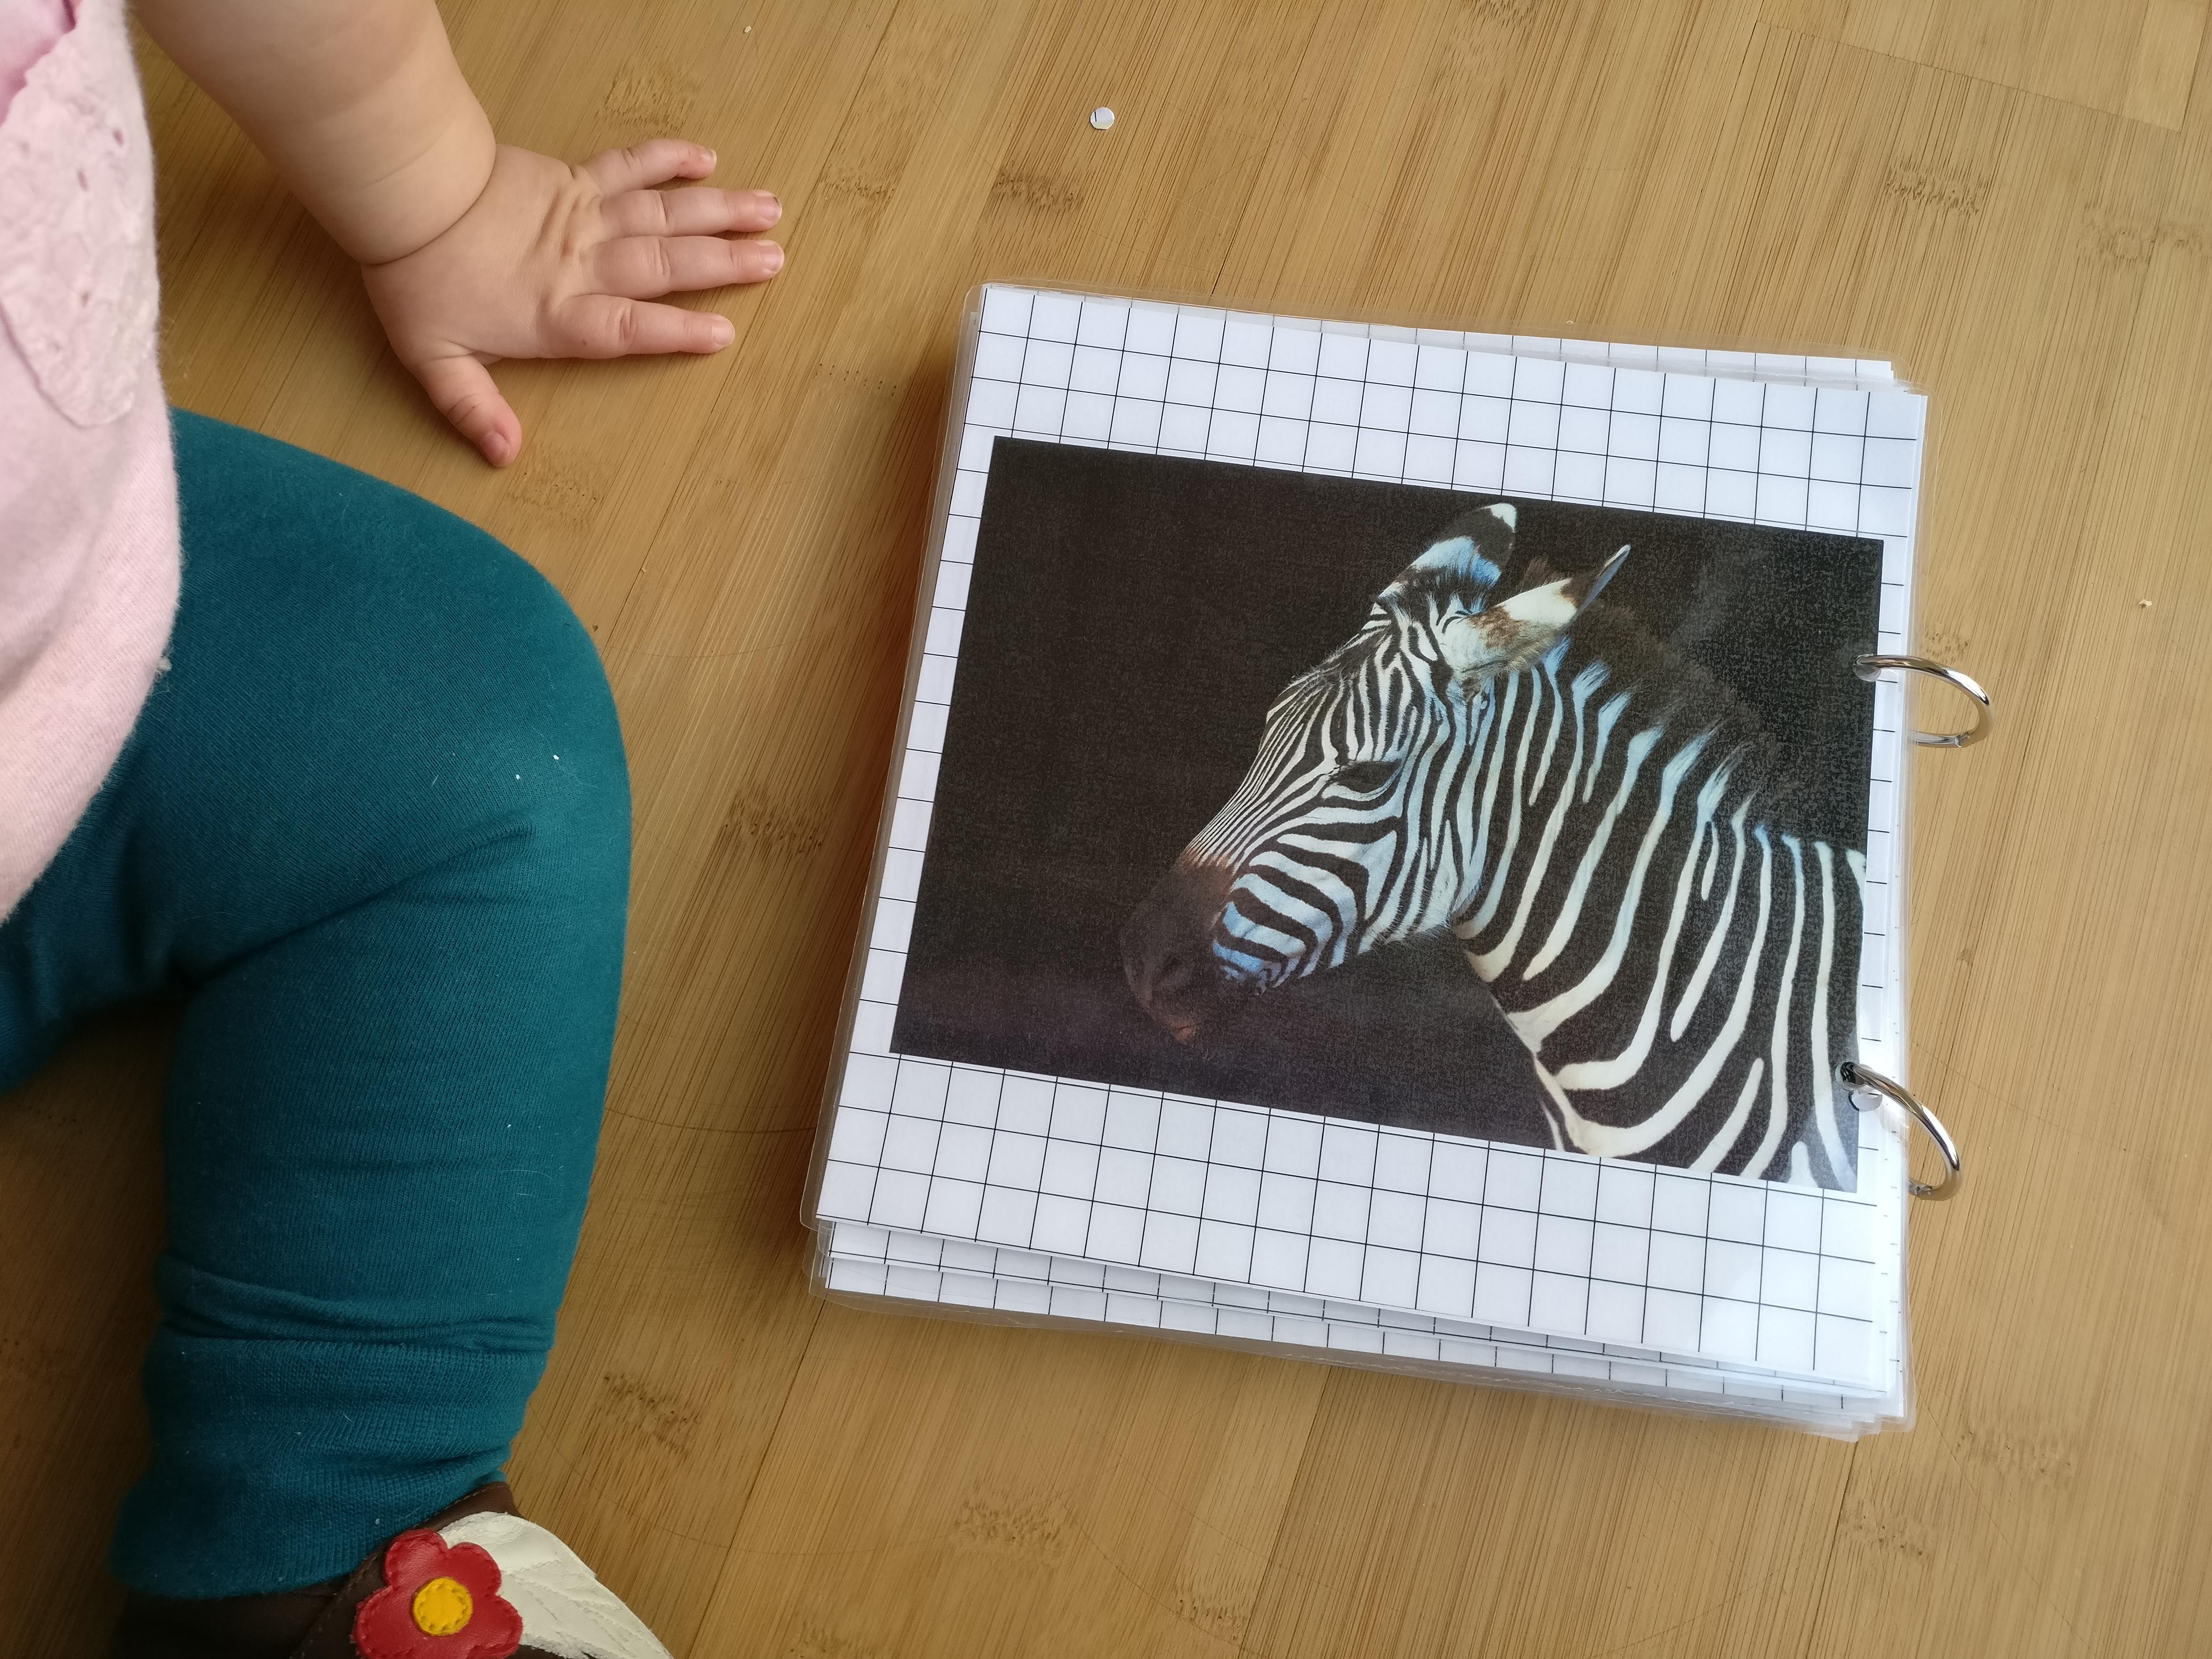 dierenboekje maken